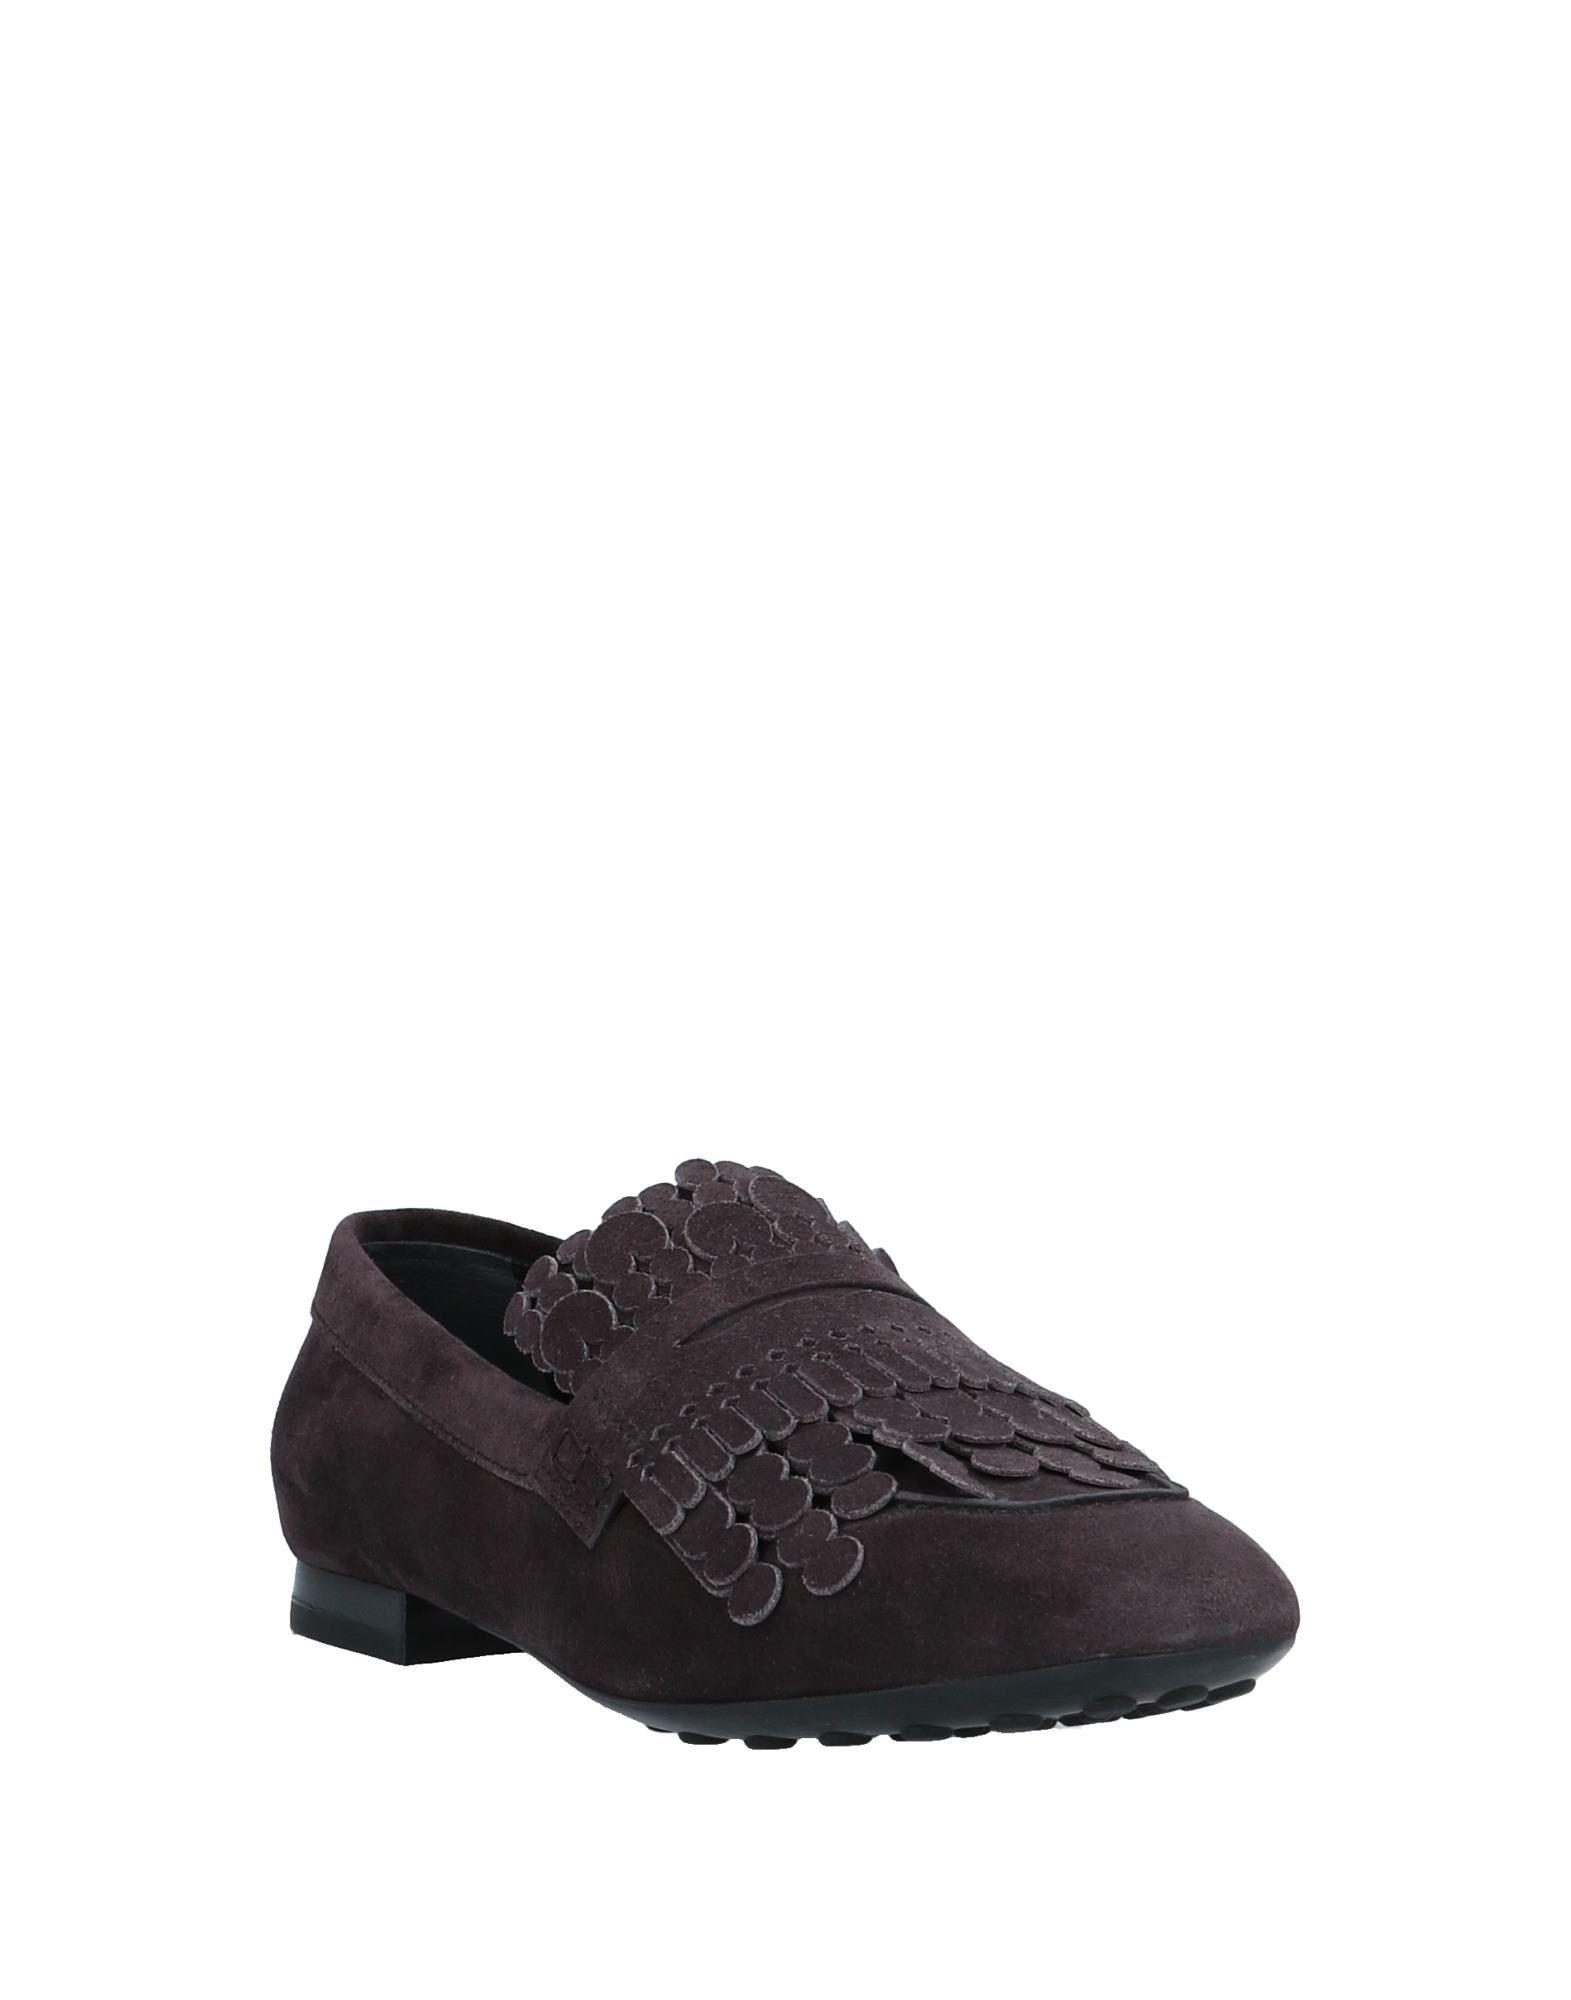 Tod's Loafers - Women Women Women Tod's Loafers online on  United Kingdom - 11568034WQ 035635